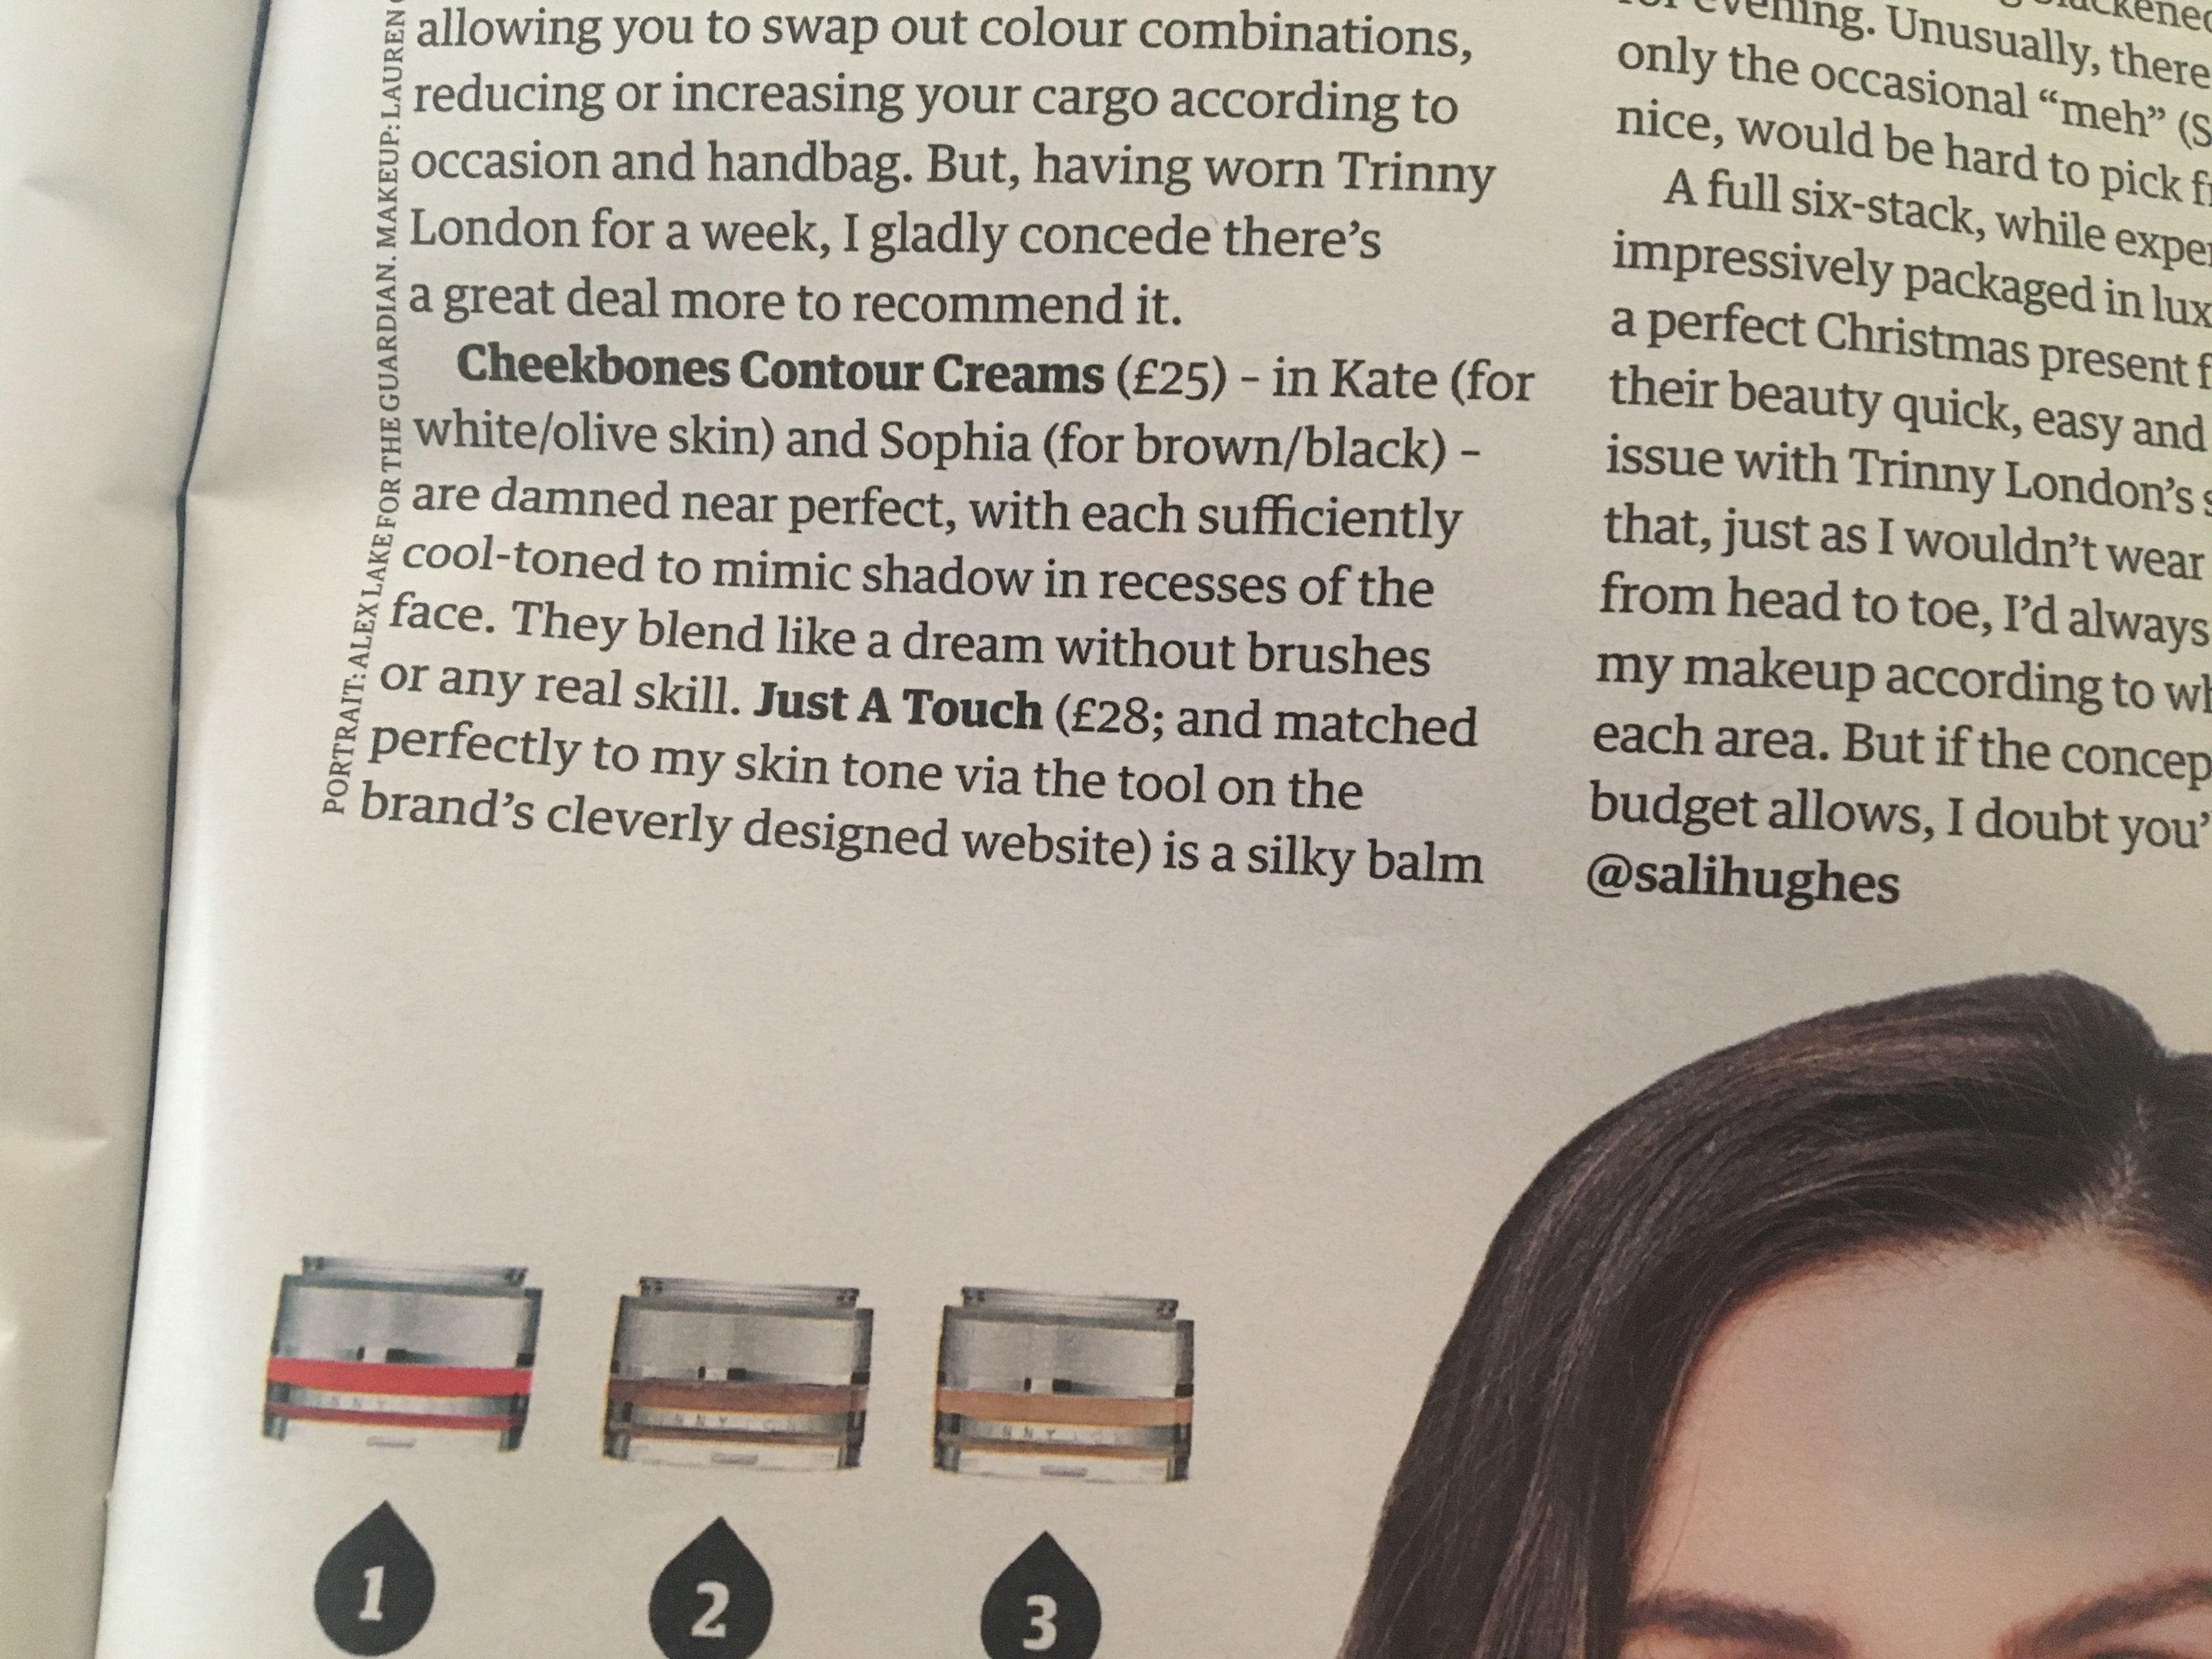 Cheekbones Contour Choose Kate Trinny